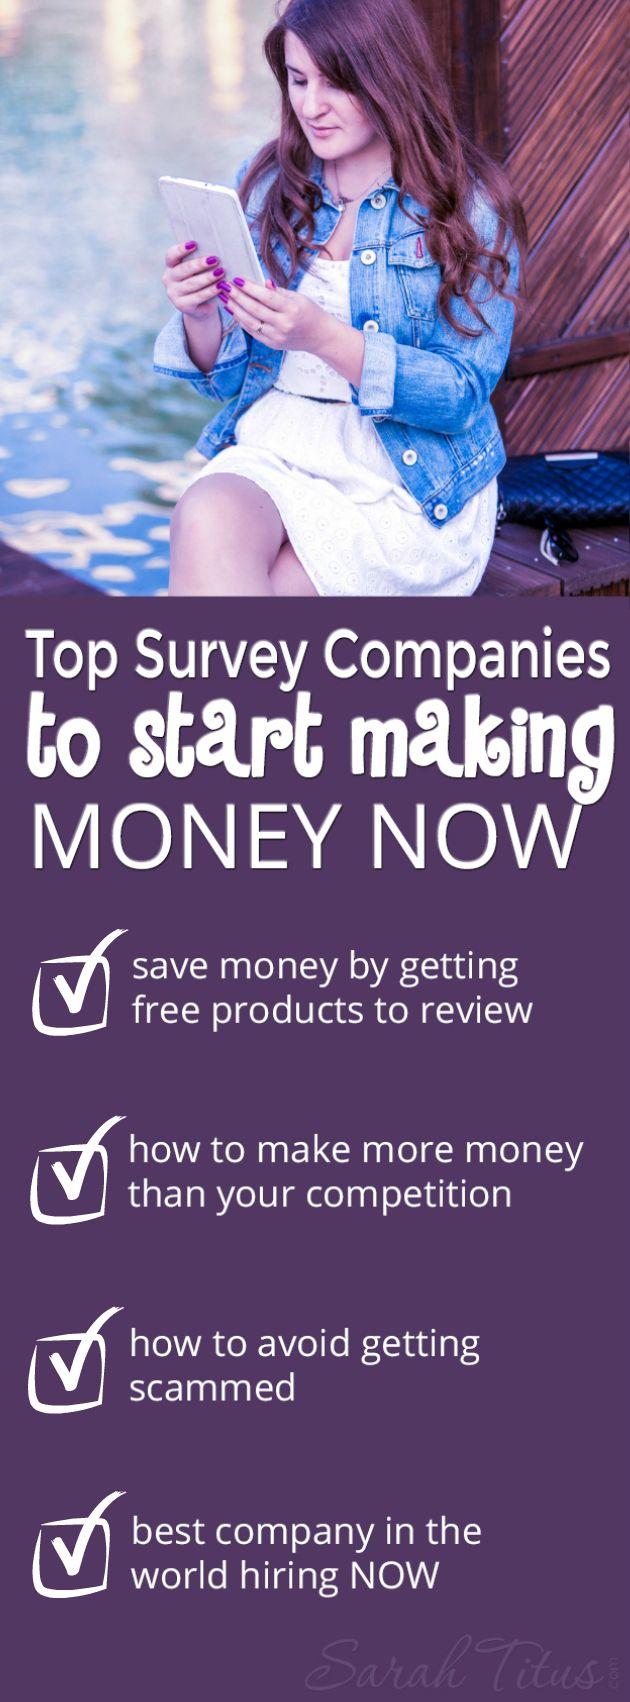 how to make a good survey on survey monkey